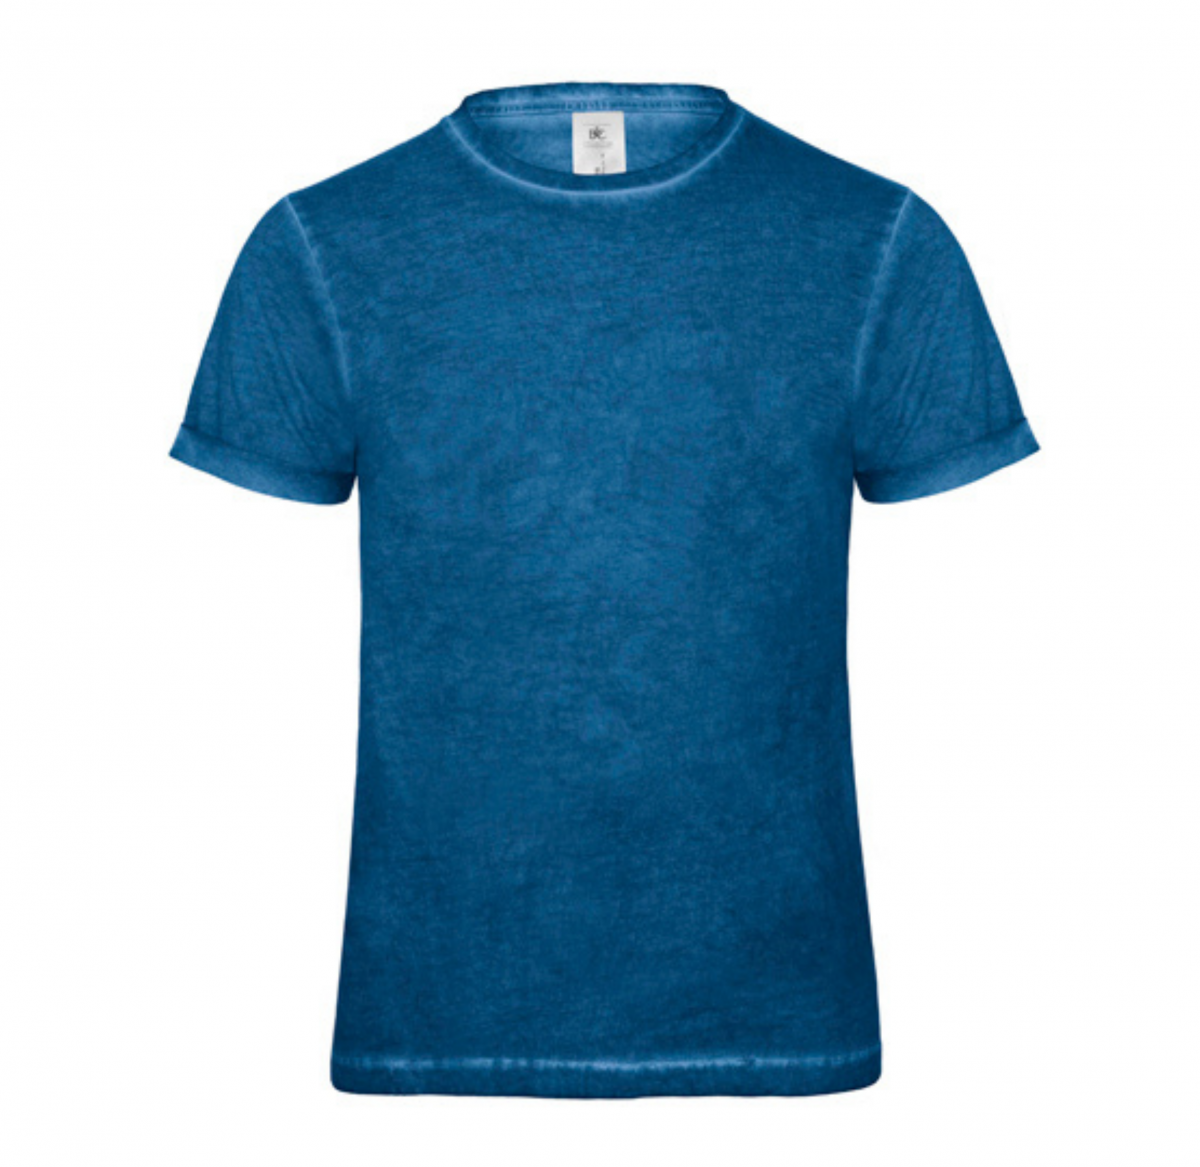 Tee-Shirt Homme Vintage - Bleu jeans